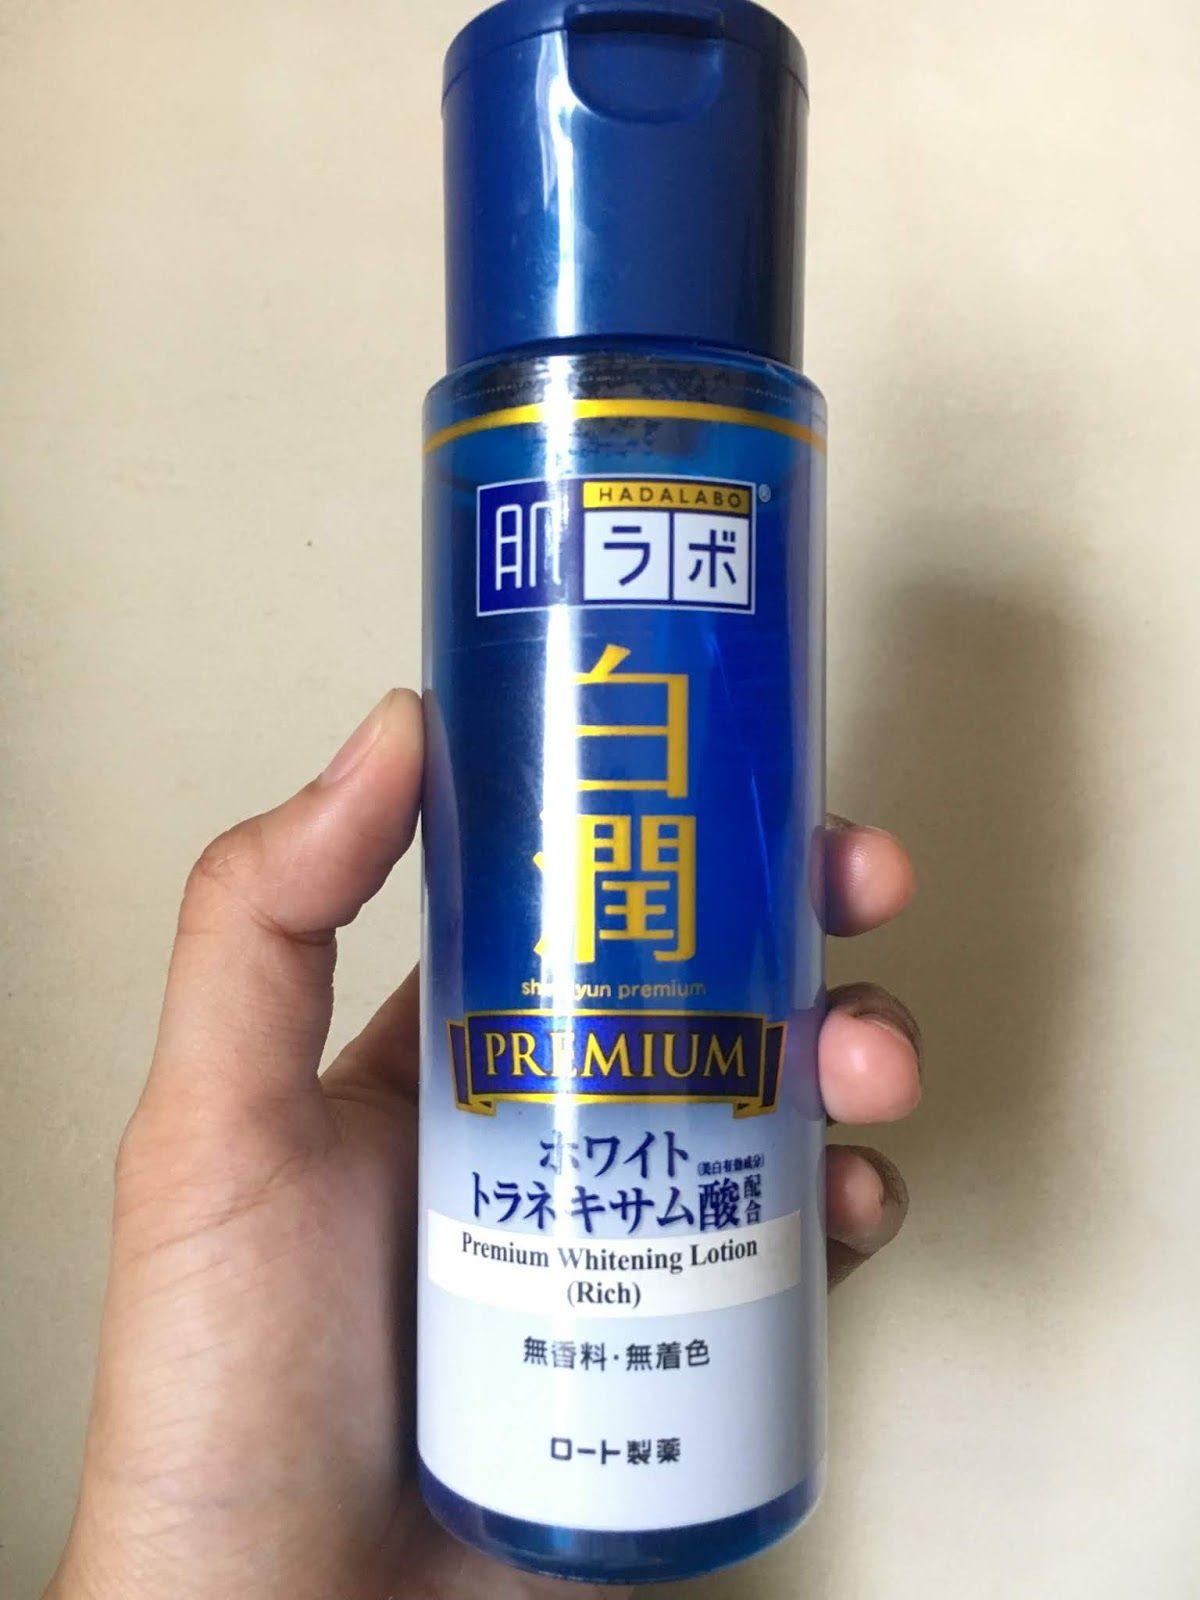 Pin on Skincare Brightening Skin